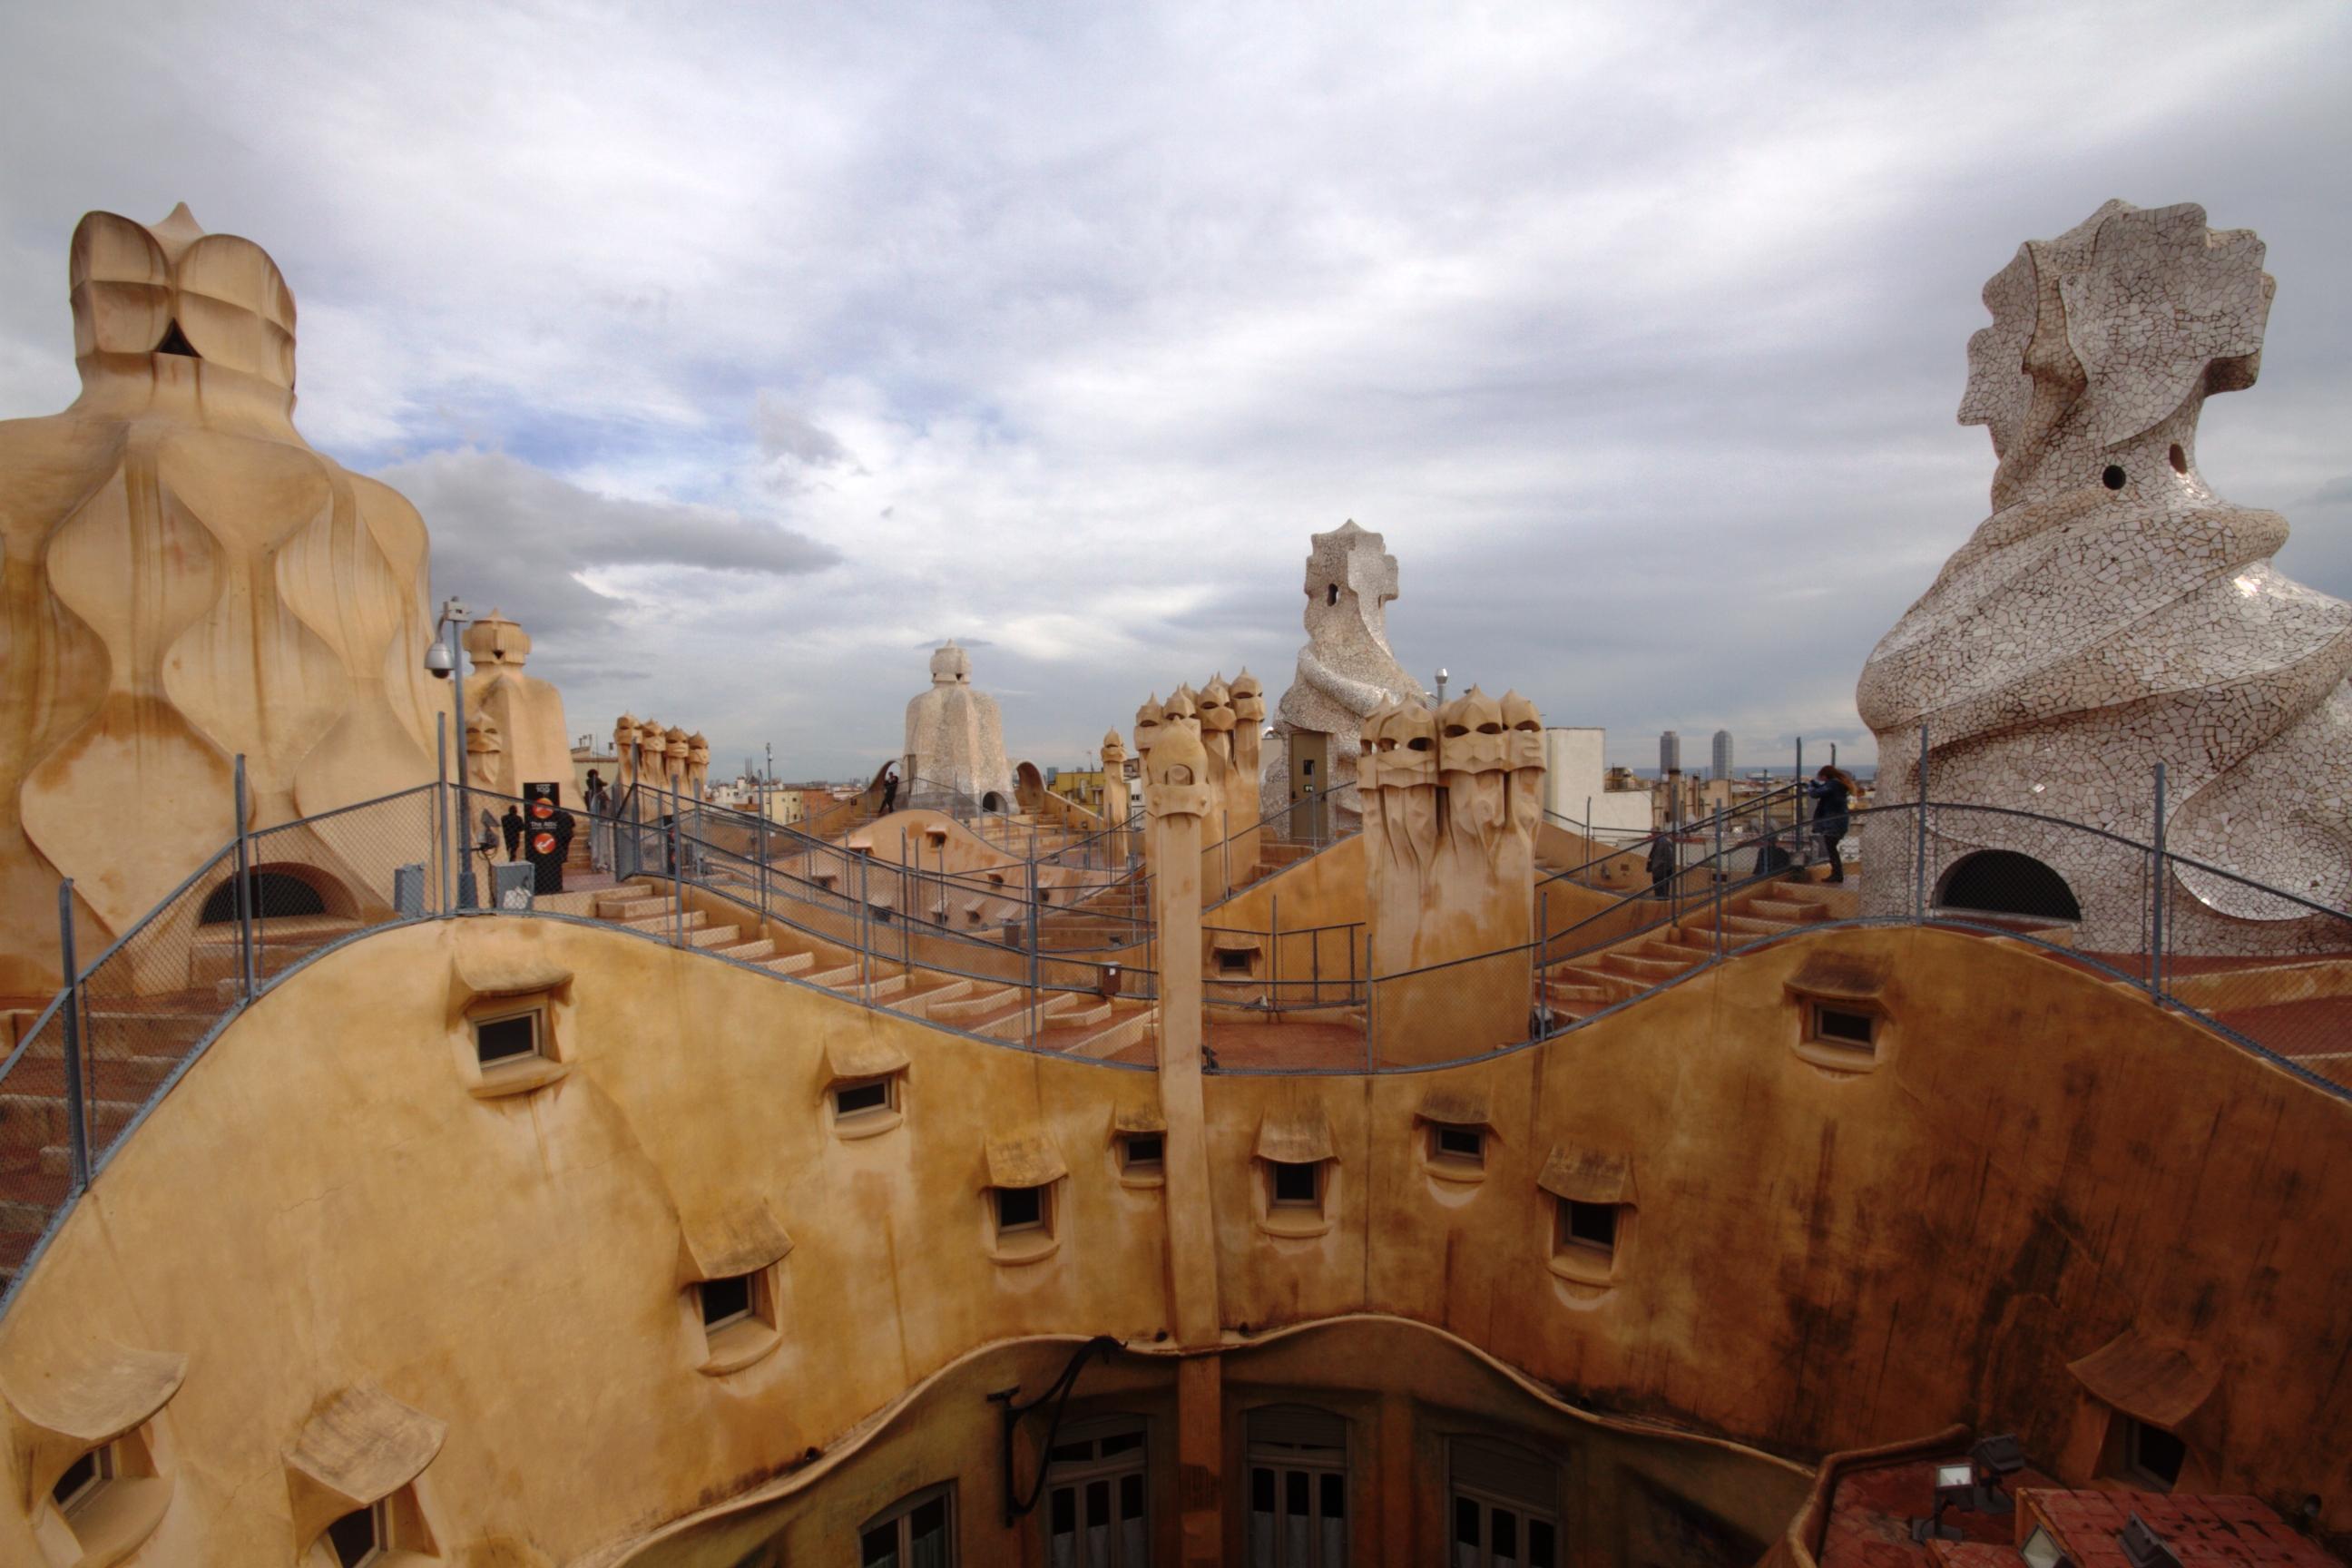 File:Casa mila roof.jpg |Casa Mila Roof